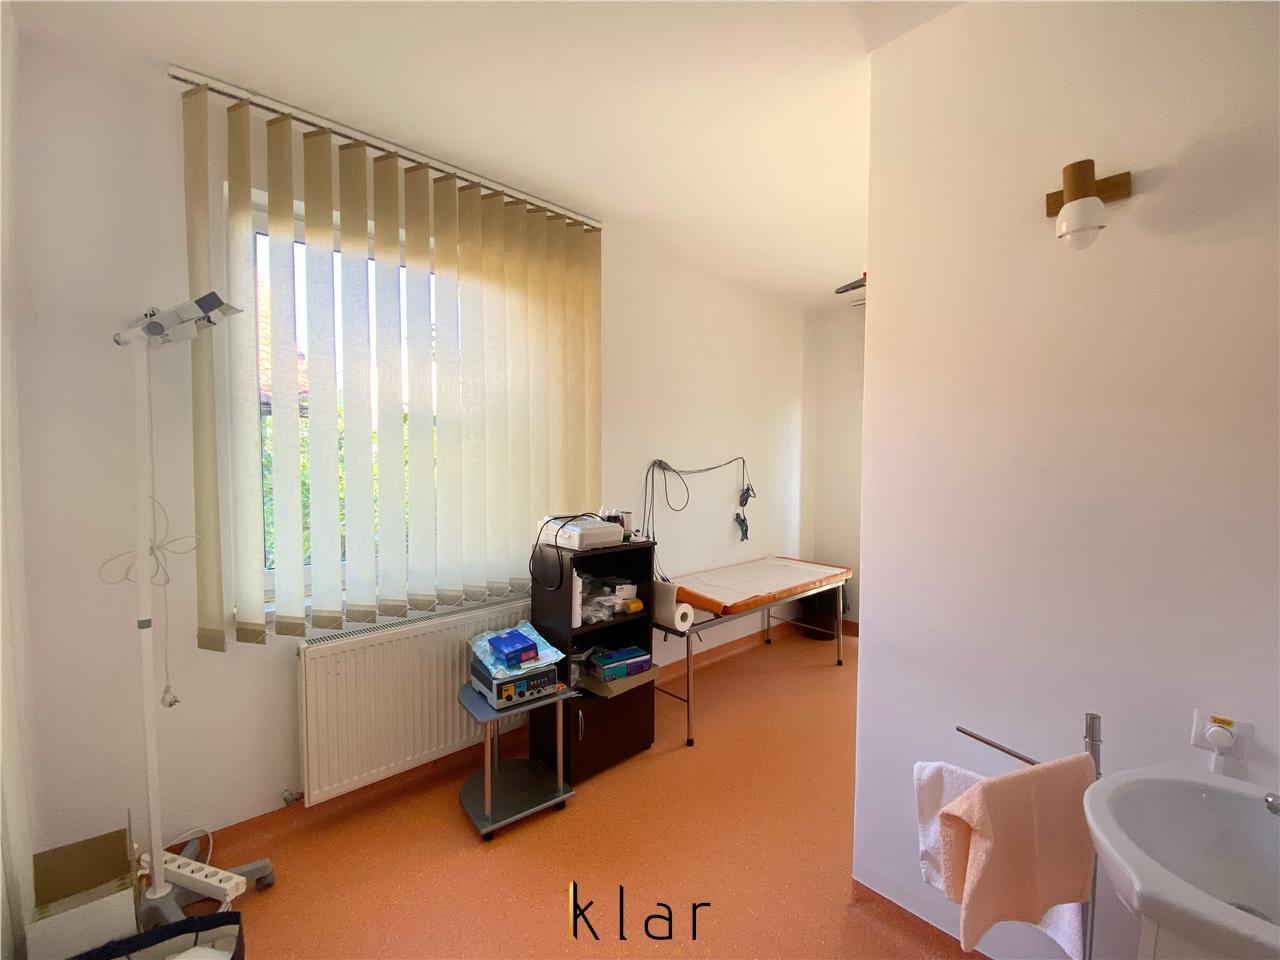 Vila pretabila clinica sau cladire de birouri !